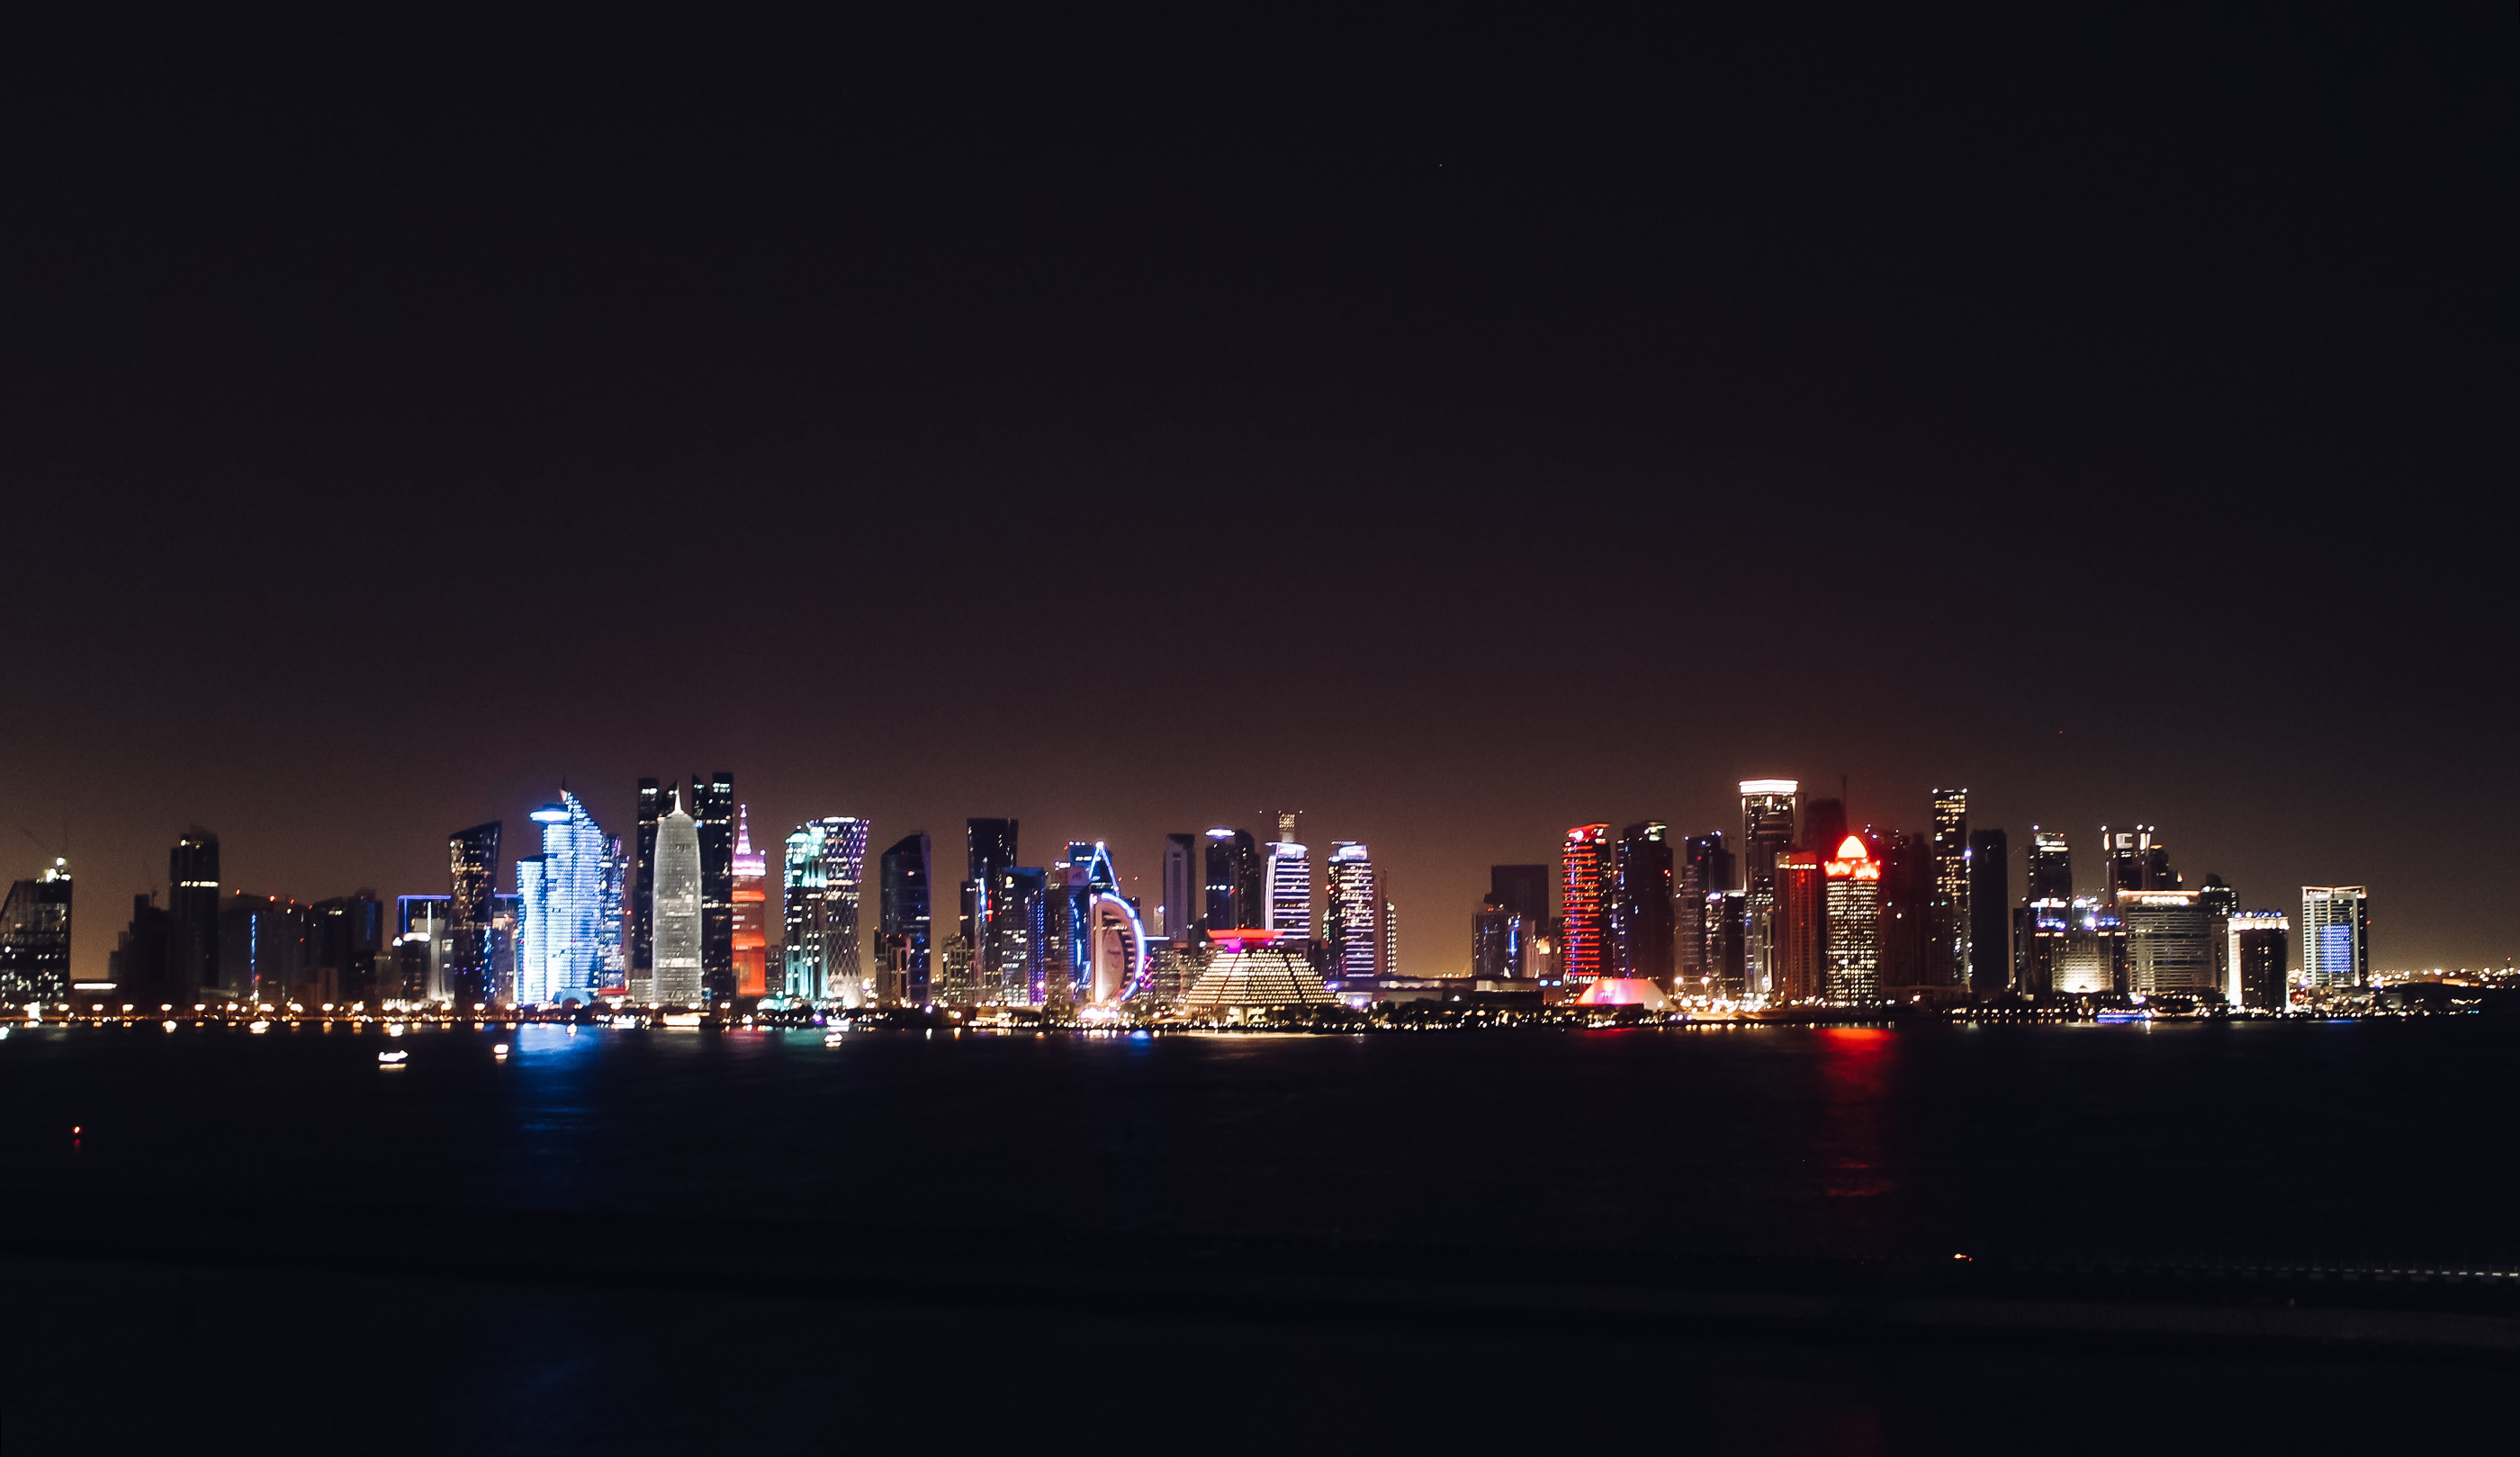 Orient Kreuzfahrt Doha Katar Westbay Nacht